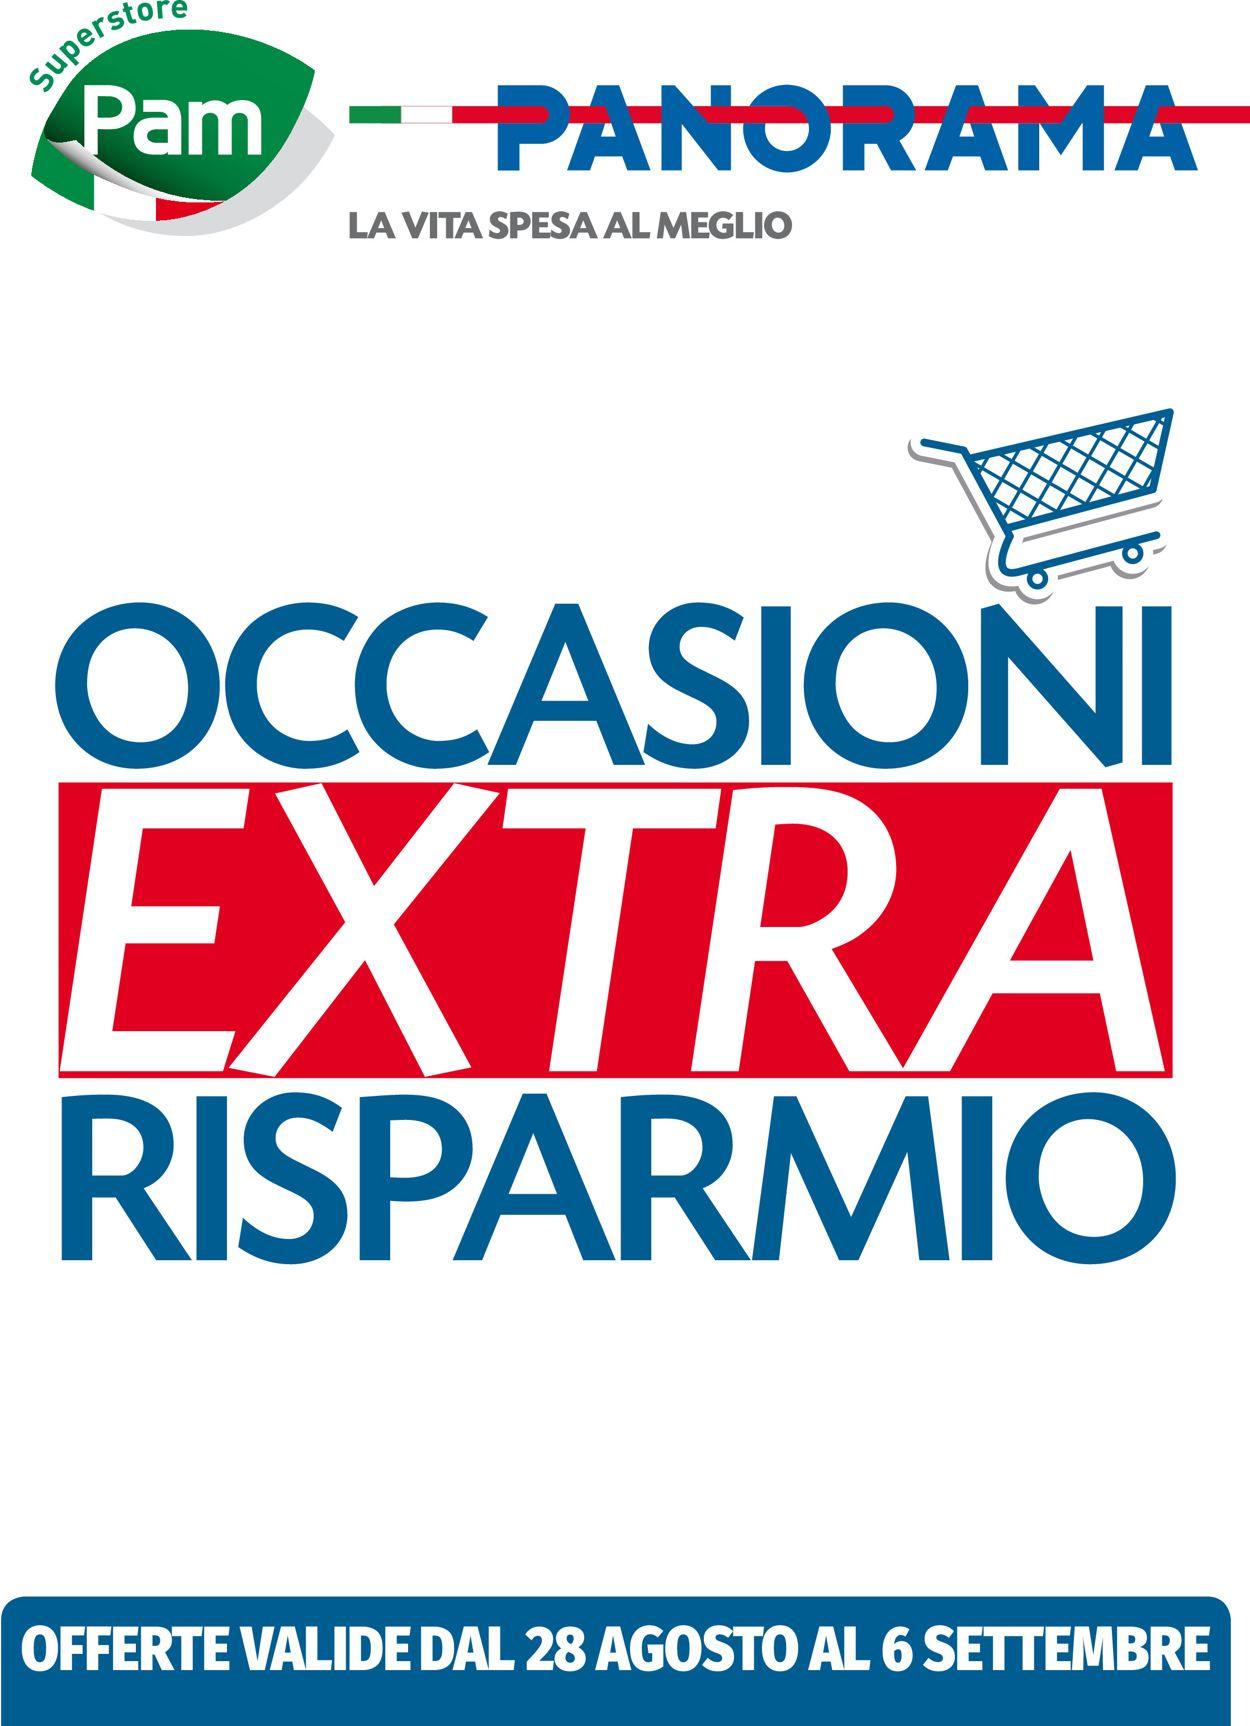 Volantino Pam Panorama - Offerte 28/08-06/09/2020